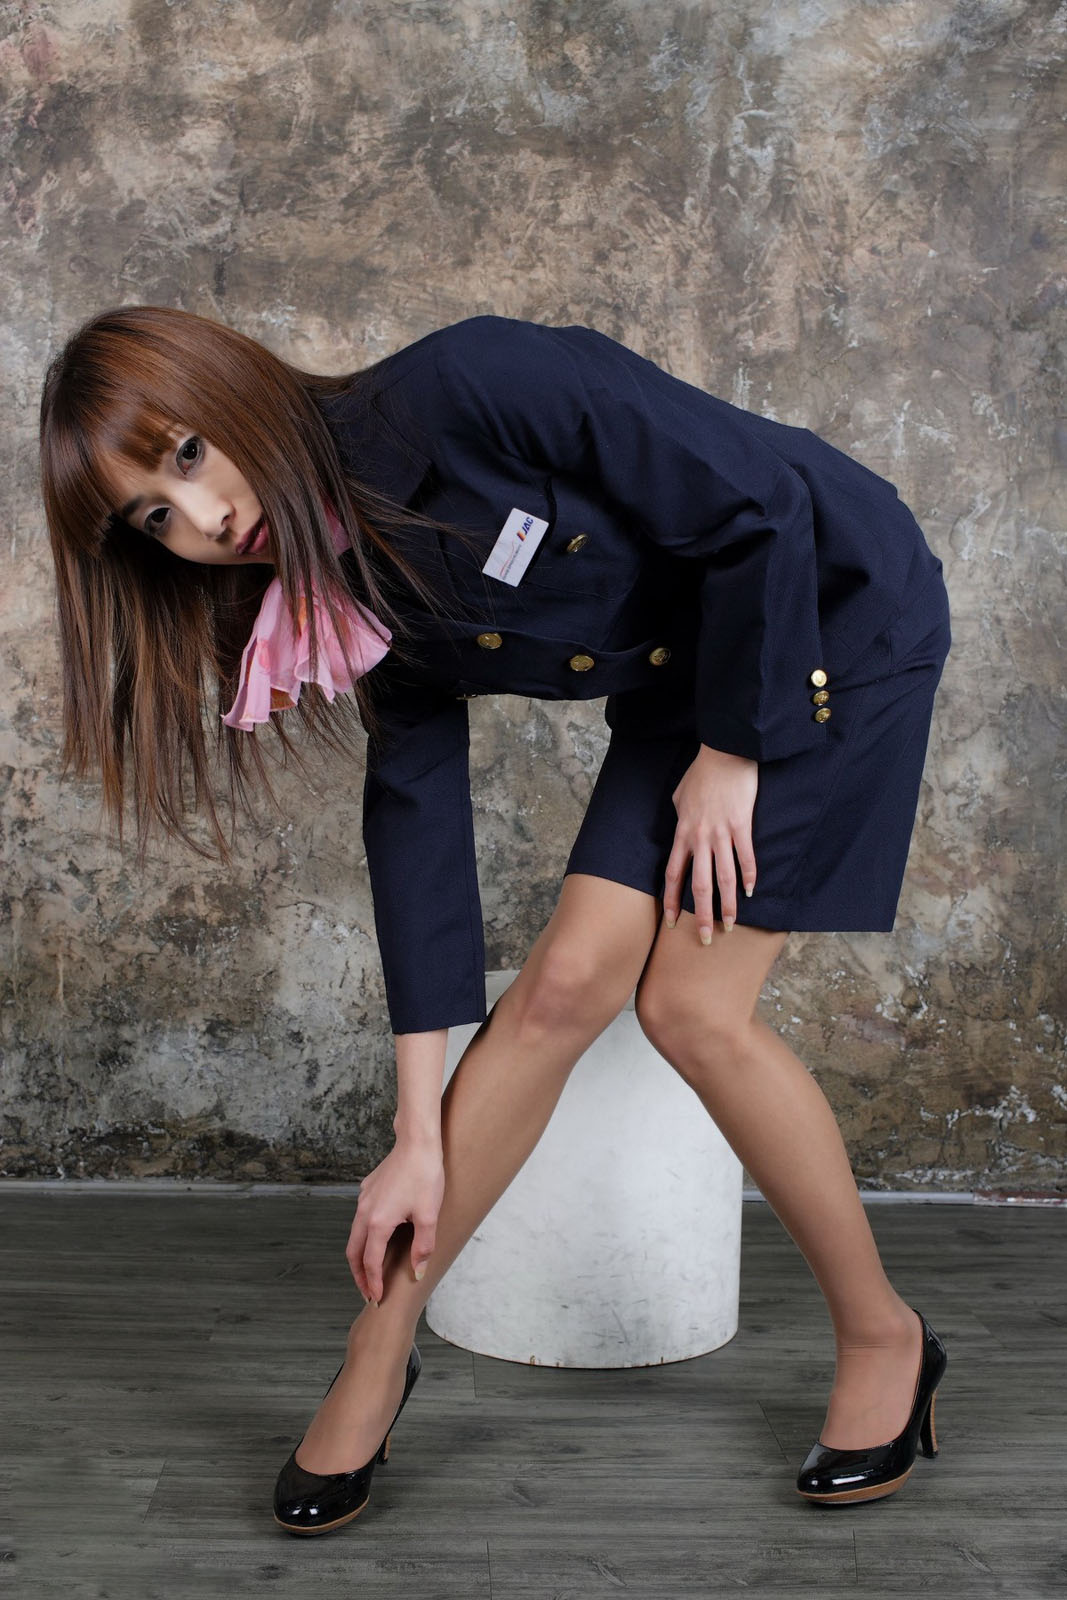 Mature japan sex